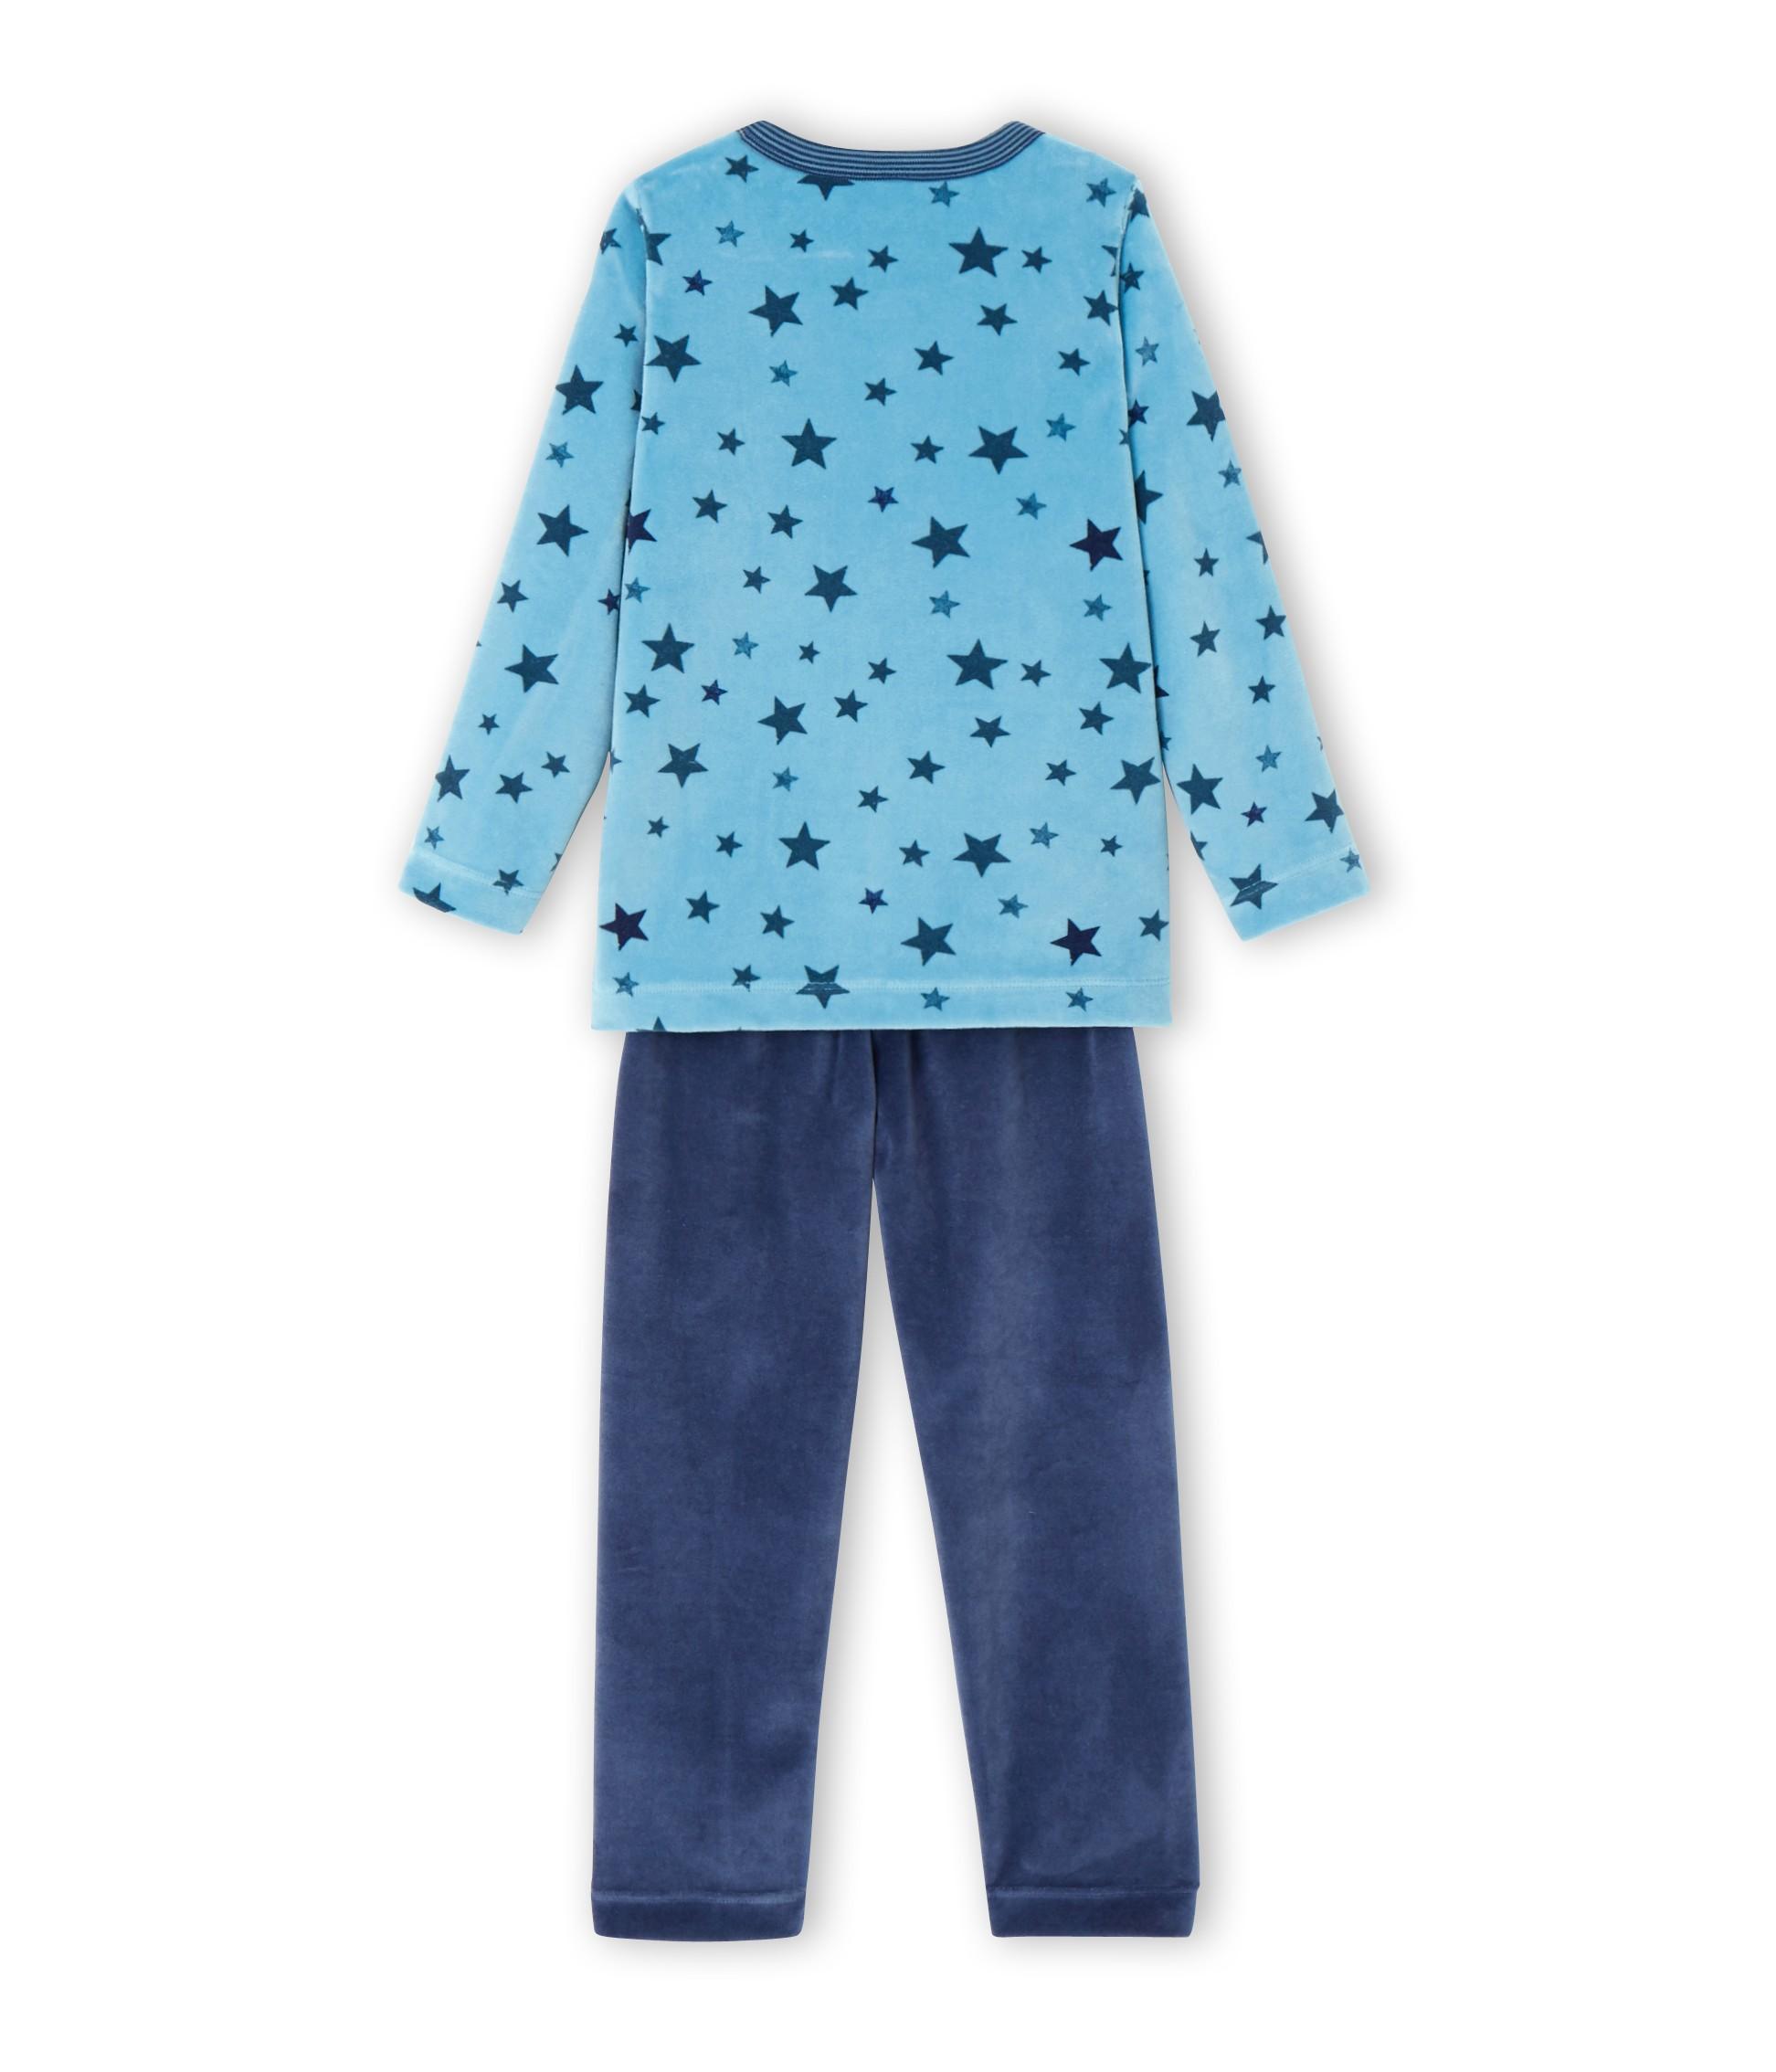 e80a4d93ce82 Boy s star print pyjamas - petit-bateau.gr